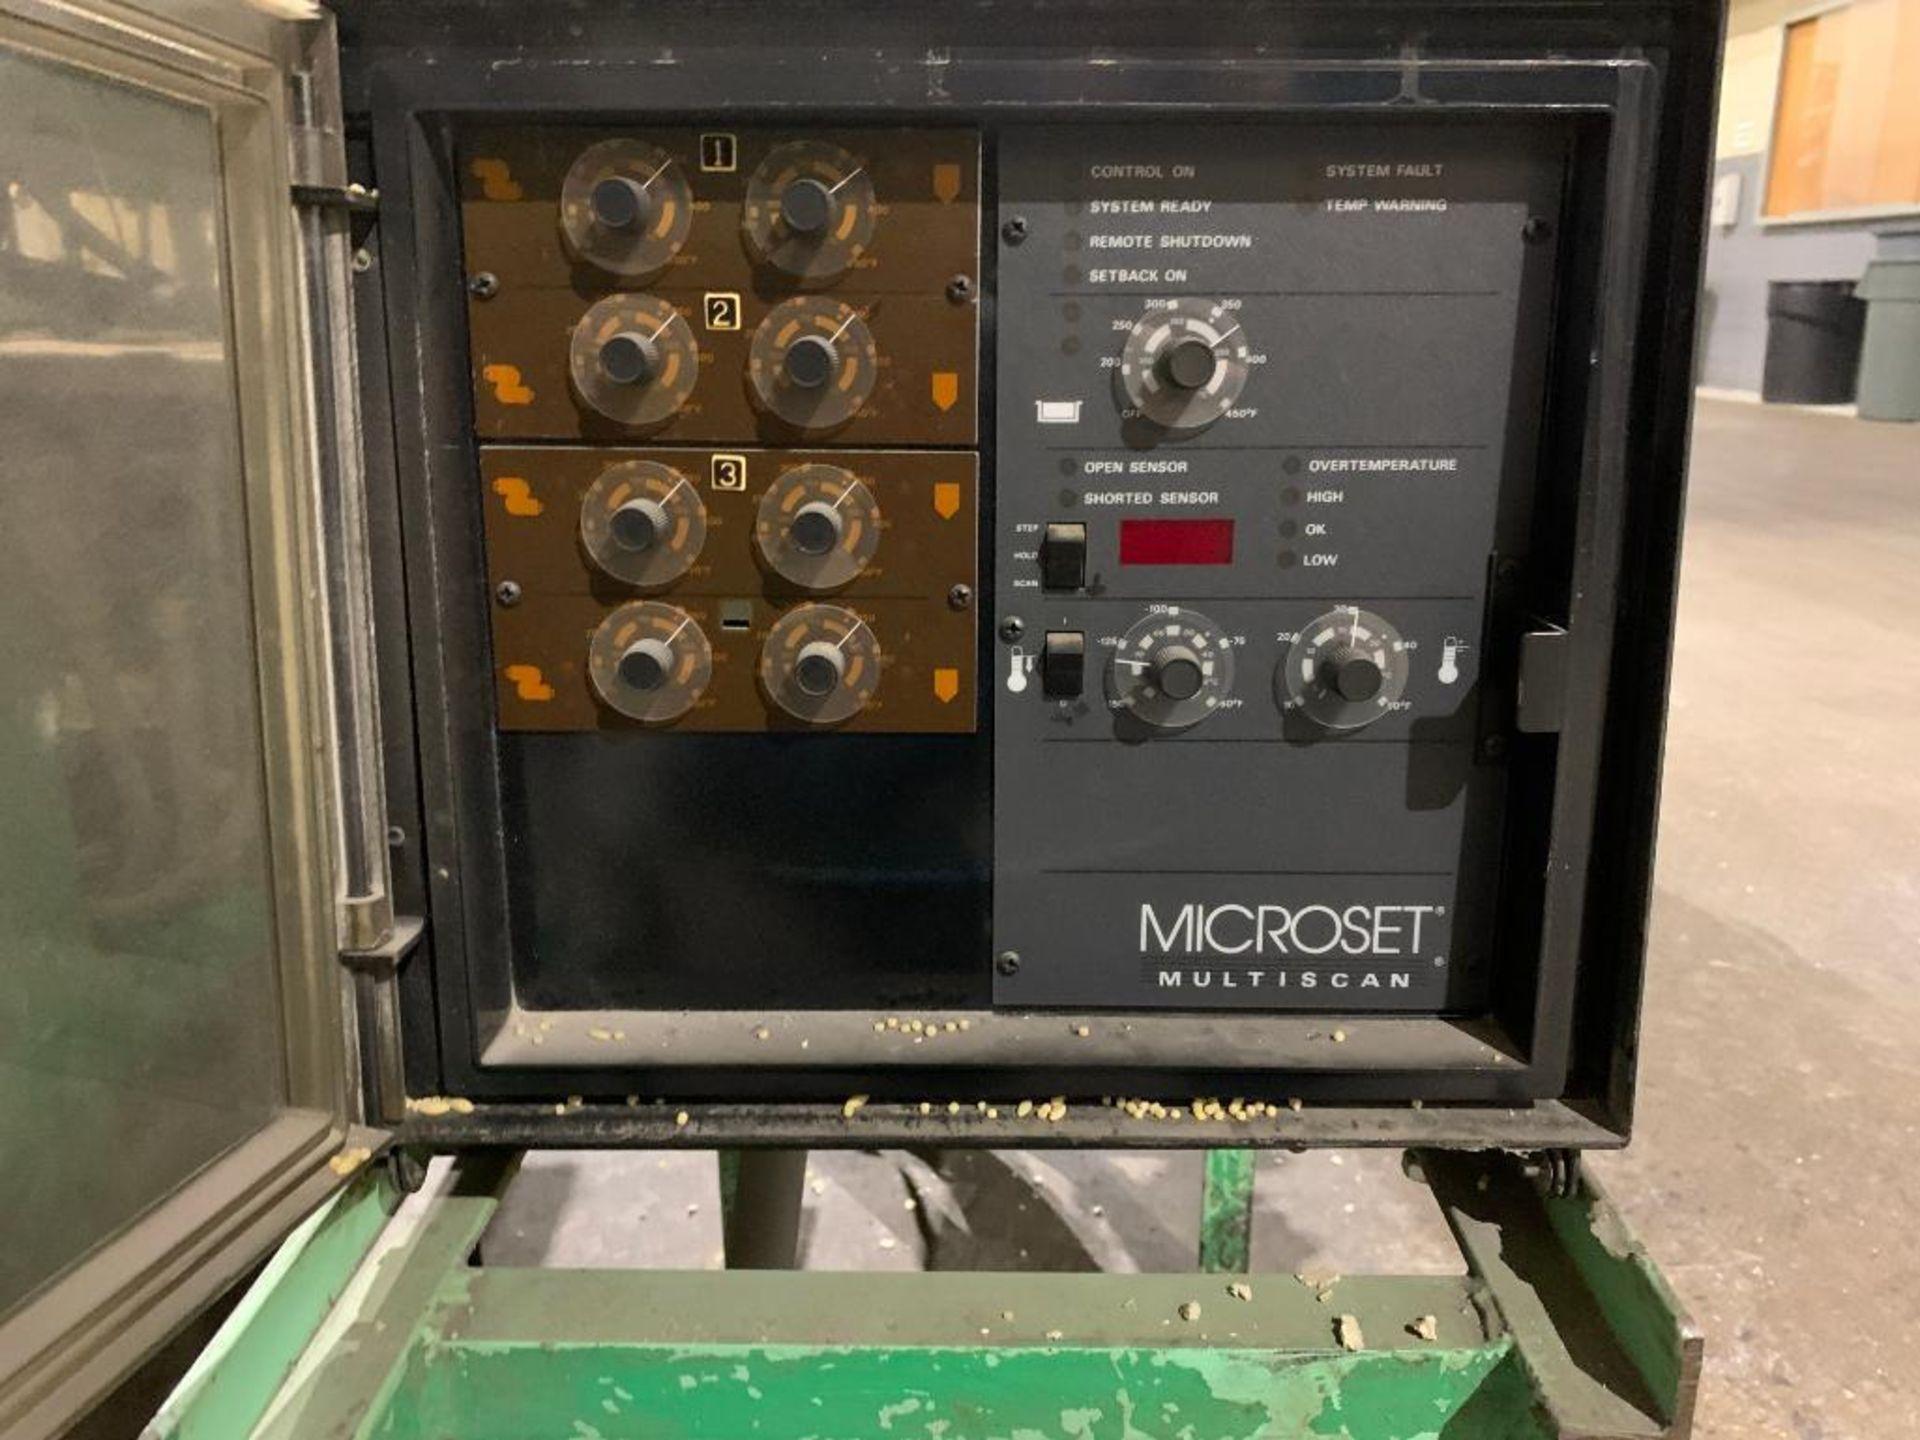 1978 Clybourn carton erecting filling closing machine - Image 6 of 68